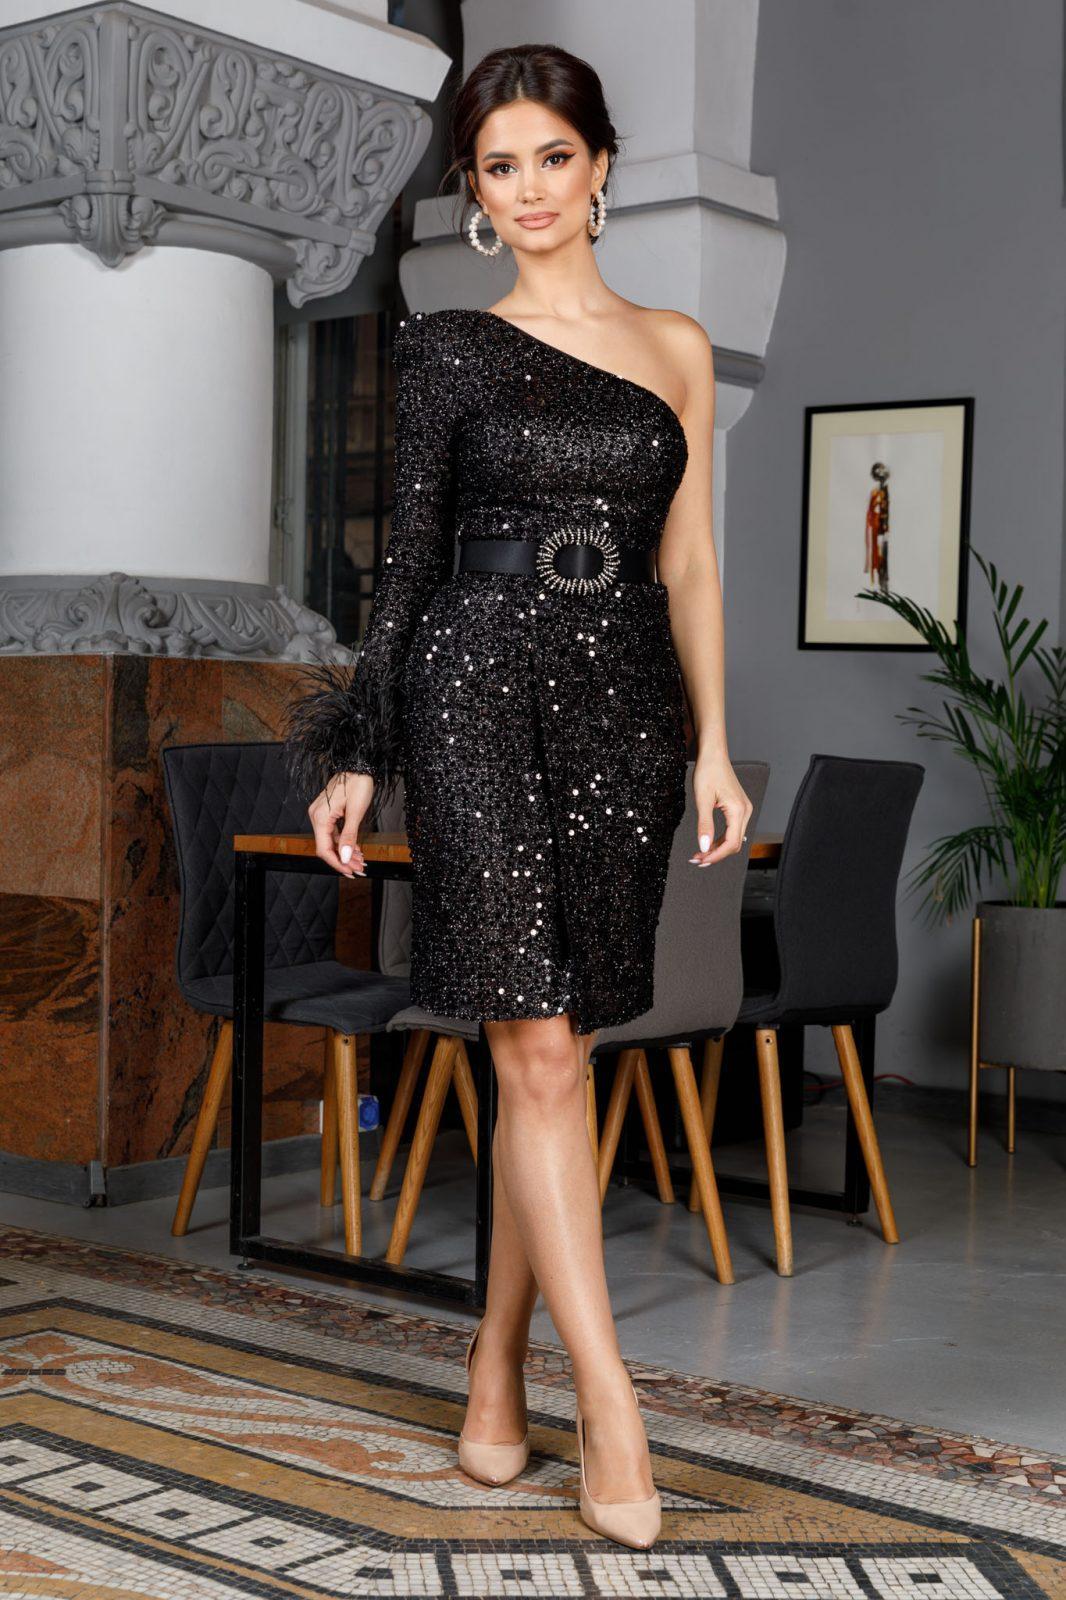 Karolyne Black Dress